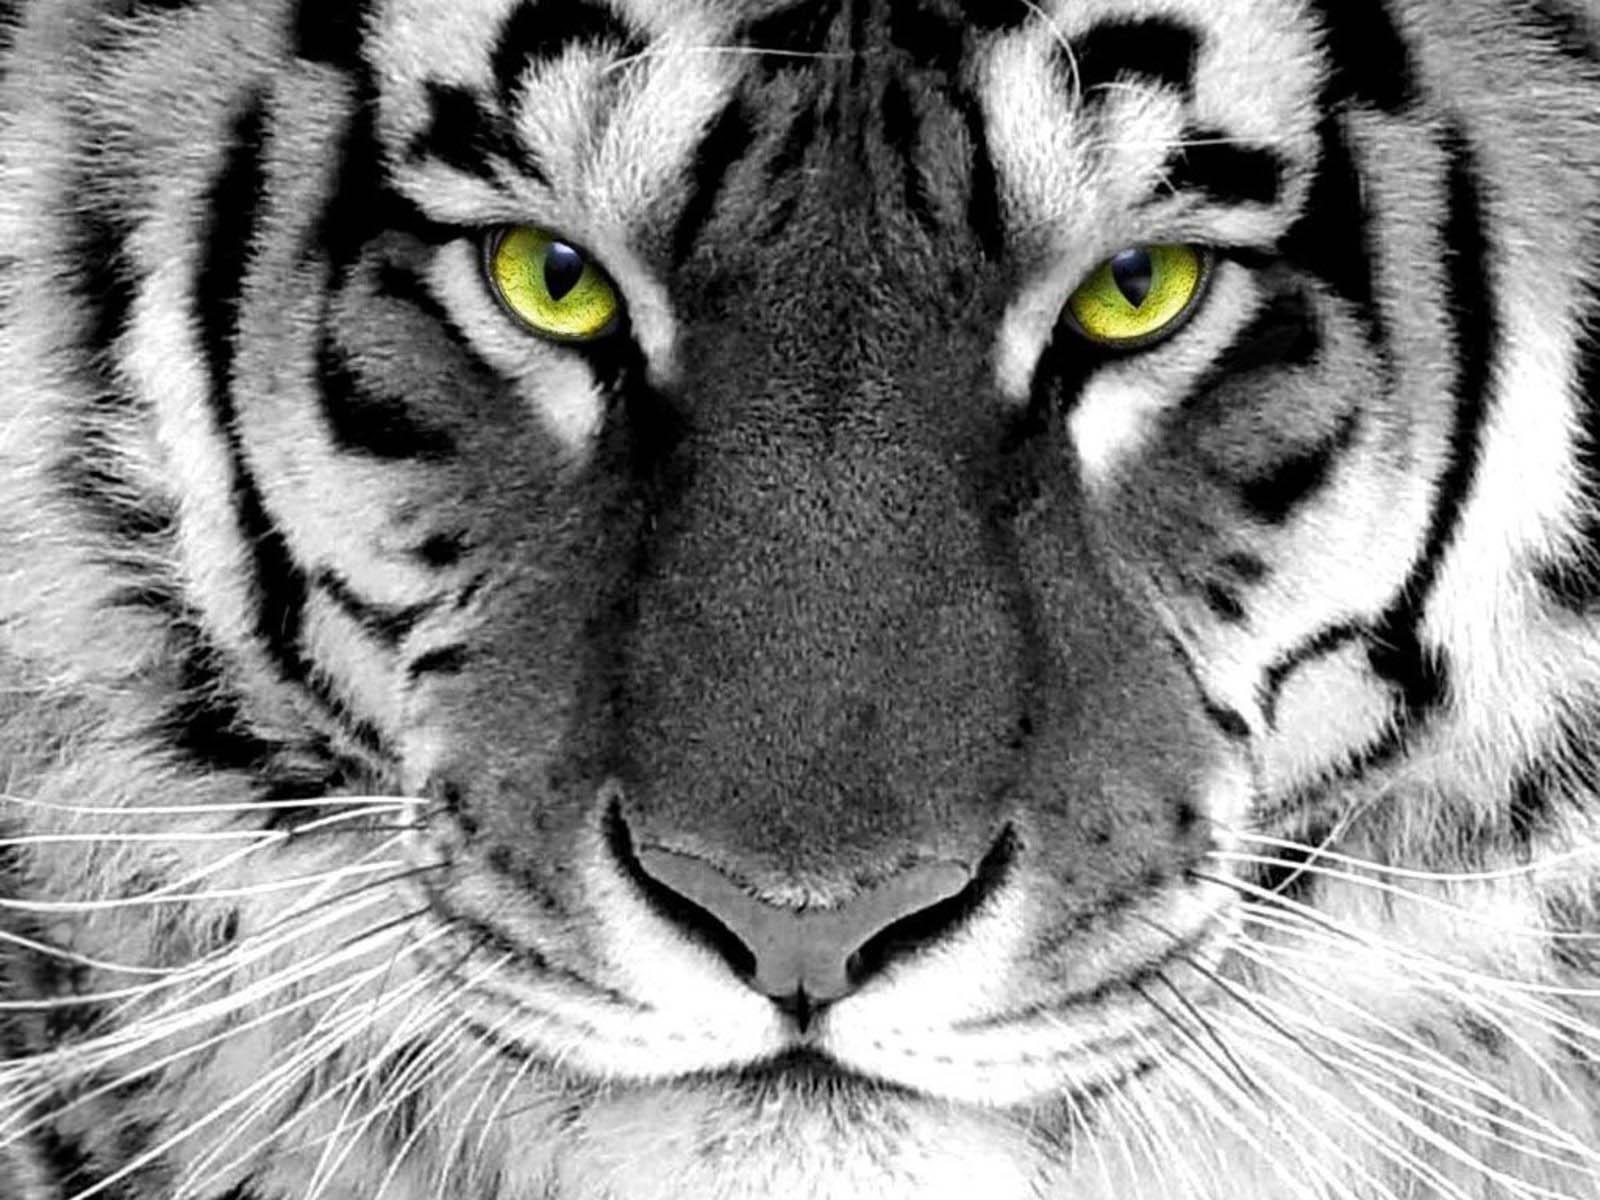 gambar kepala macan - gambar macan